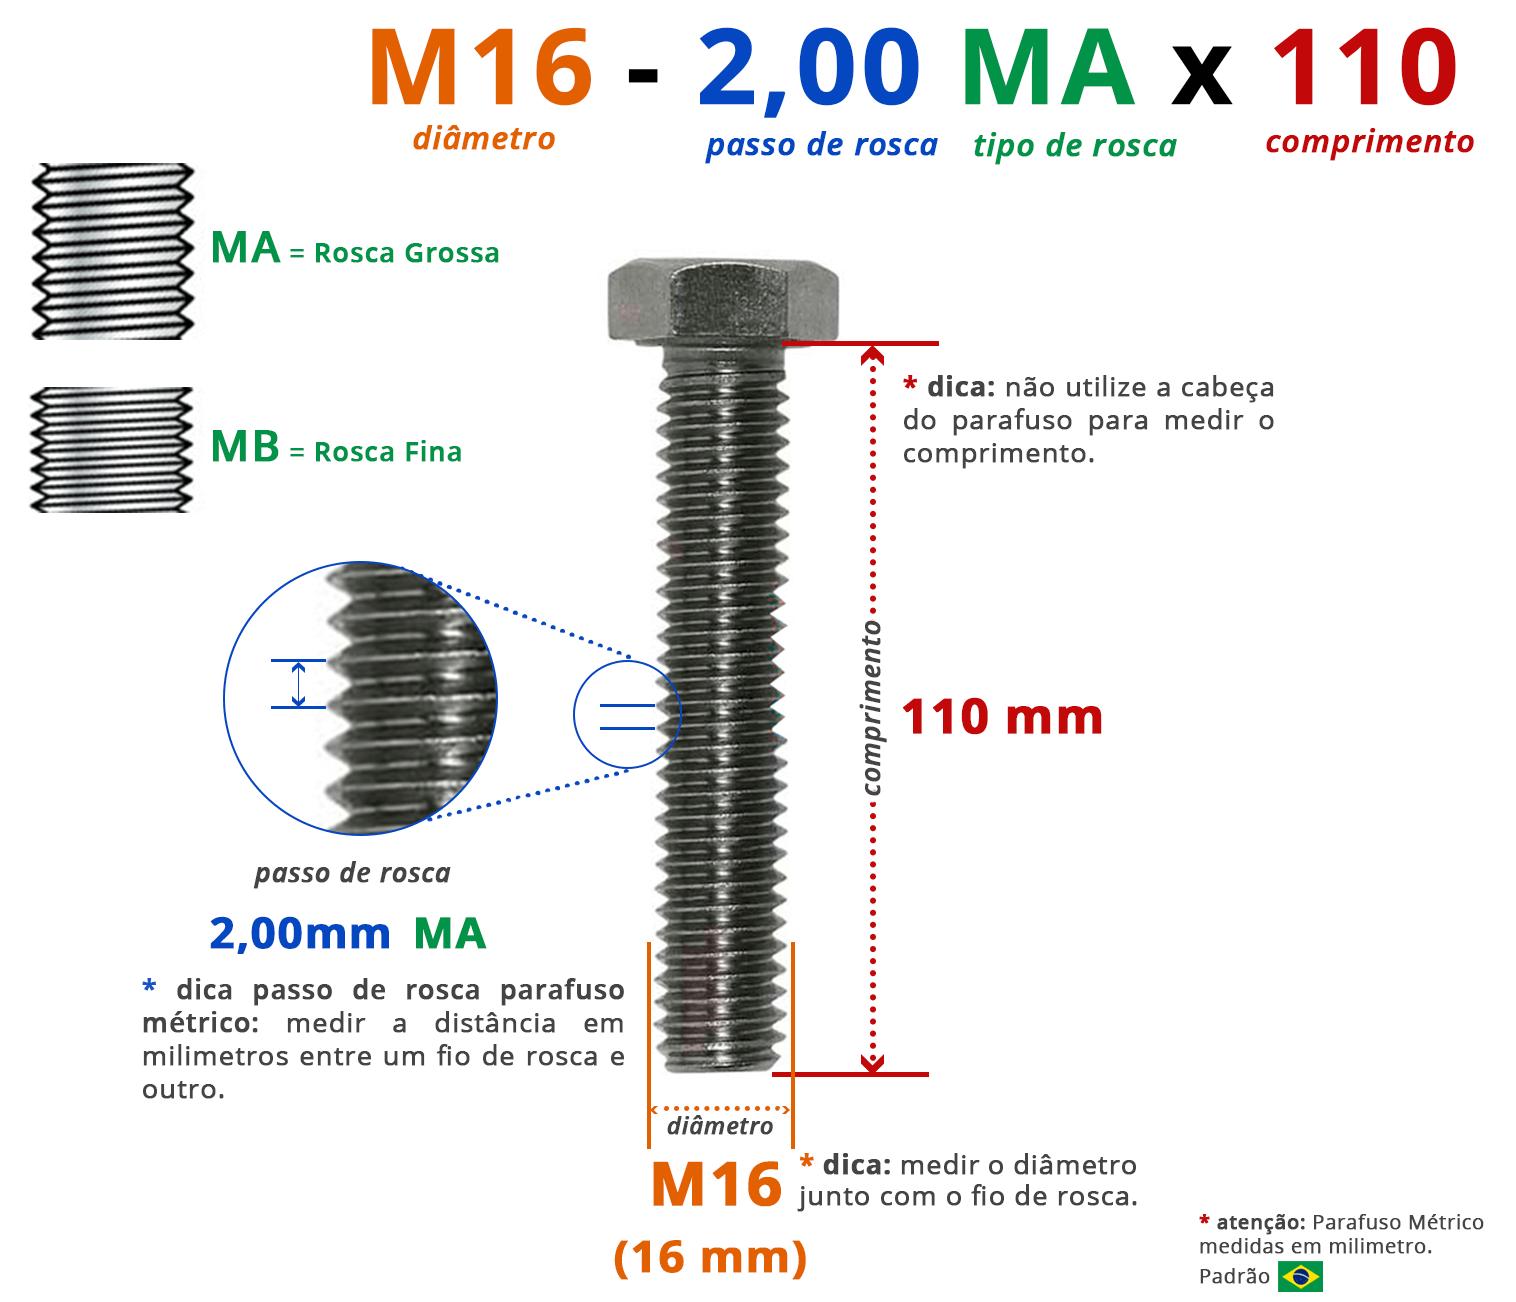 PARAFUSO SEXTAVADO ROSCA INTEIRA M16 2,00 MA X 110 DIN 933 INOX A4